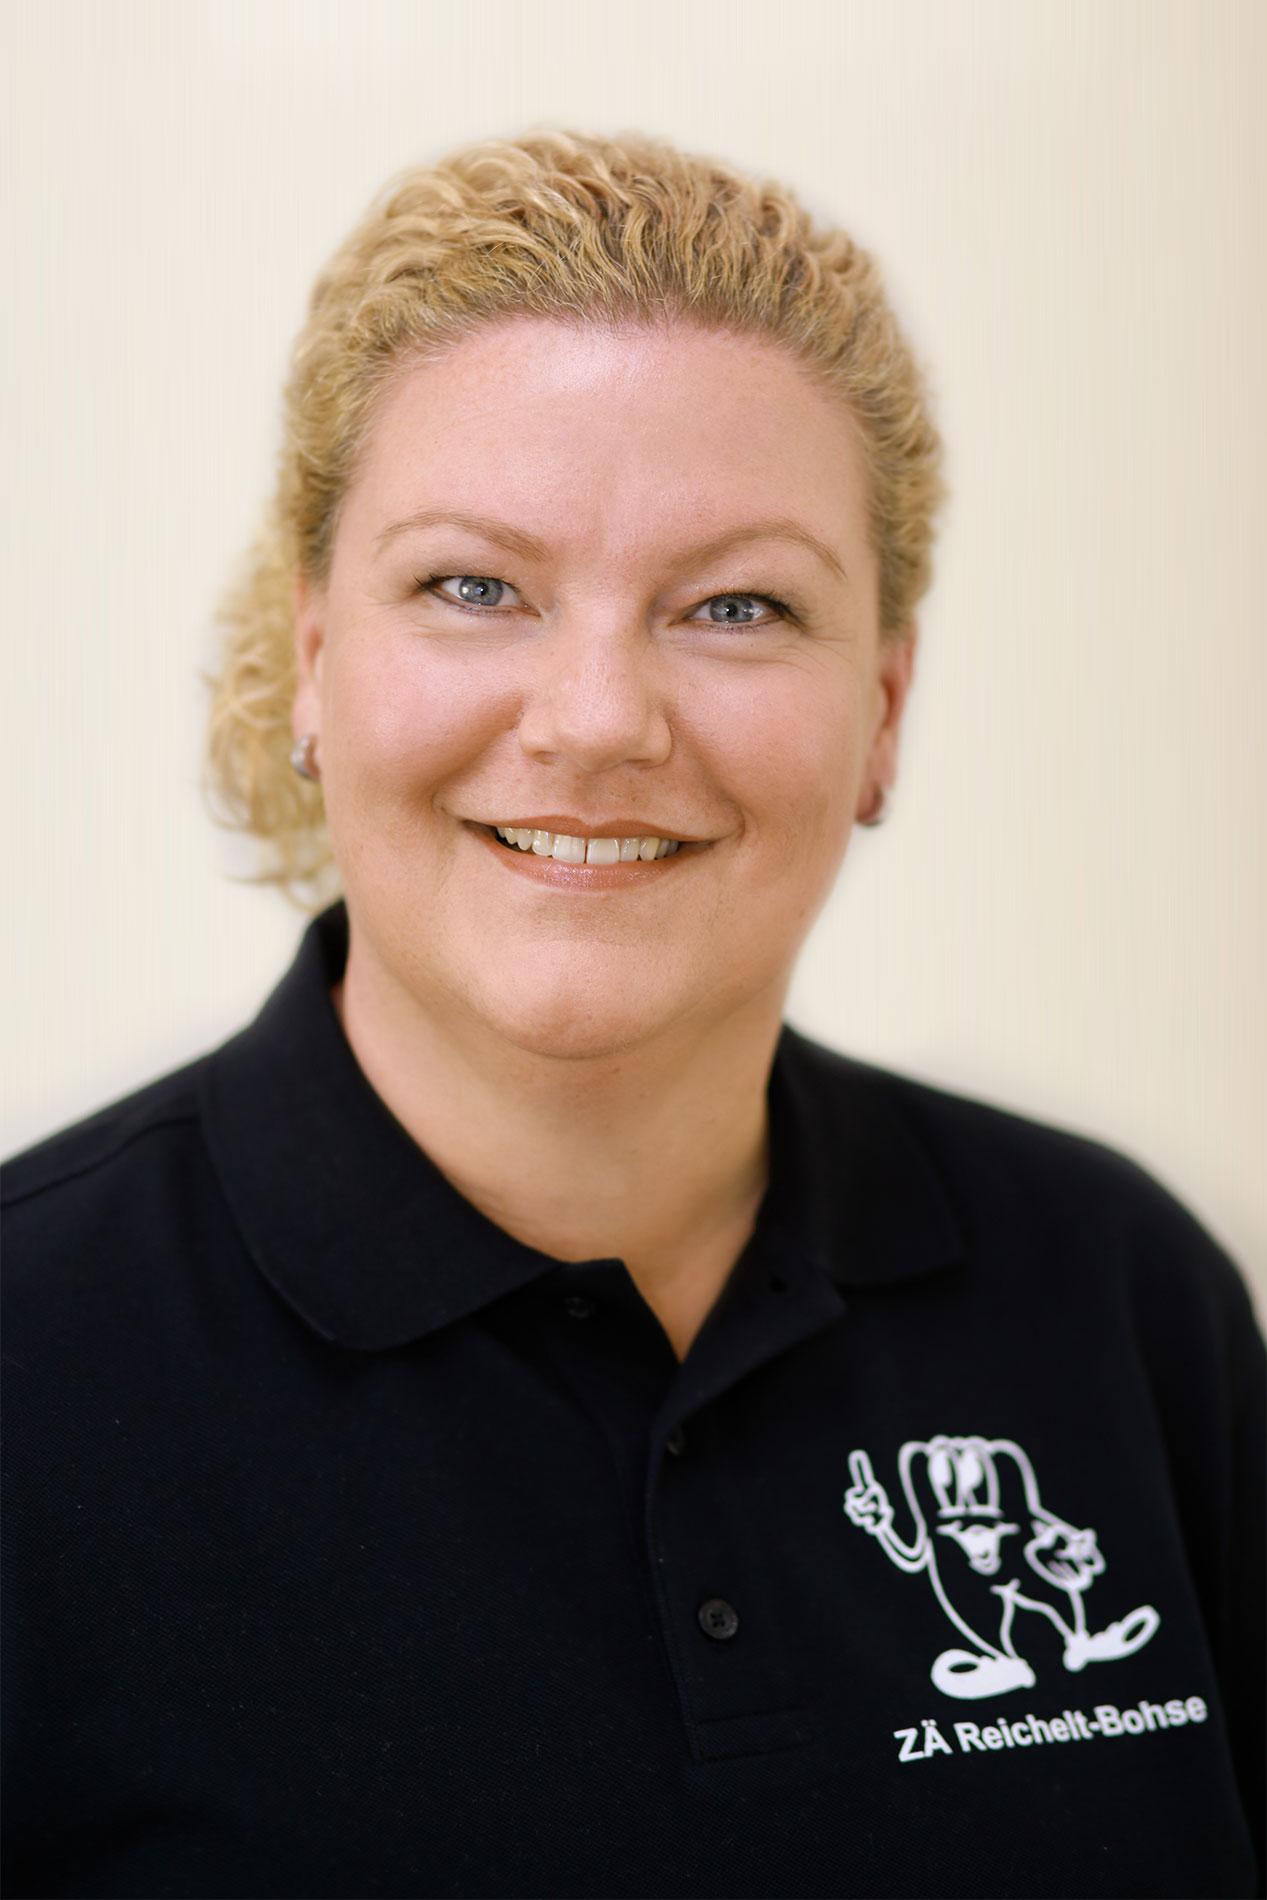 Christina Reichelt-Bohse